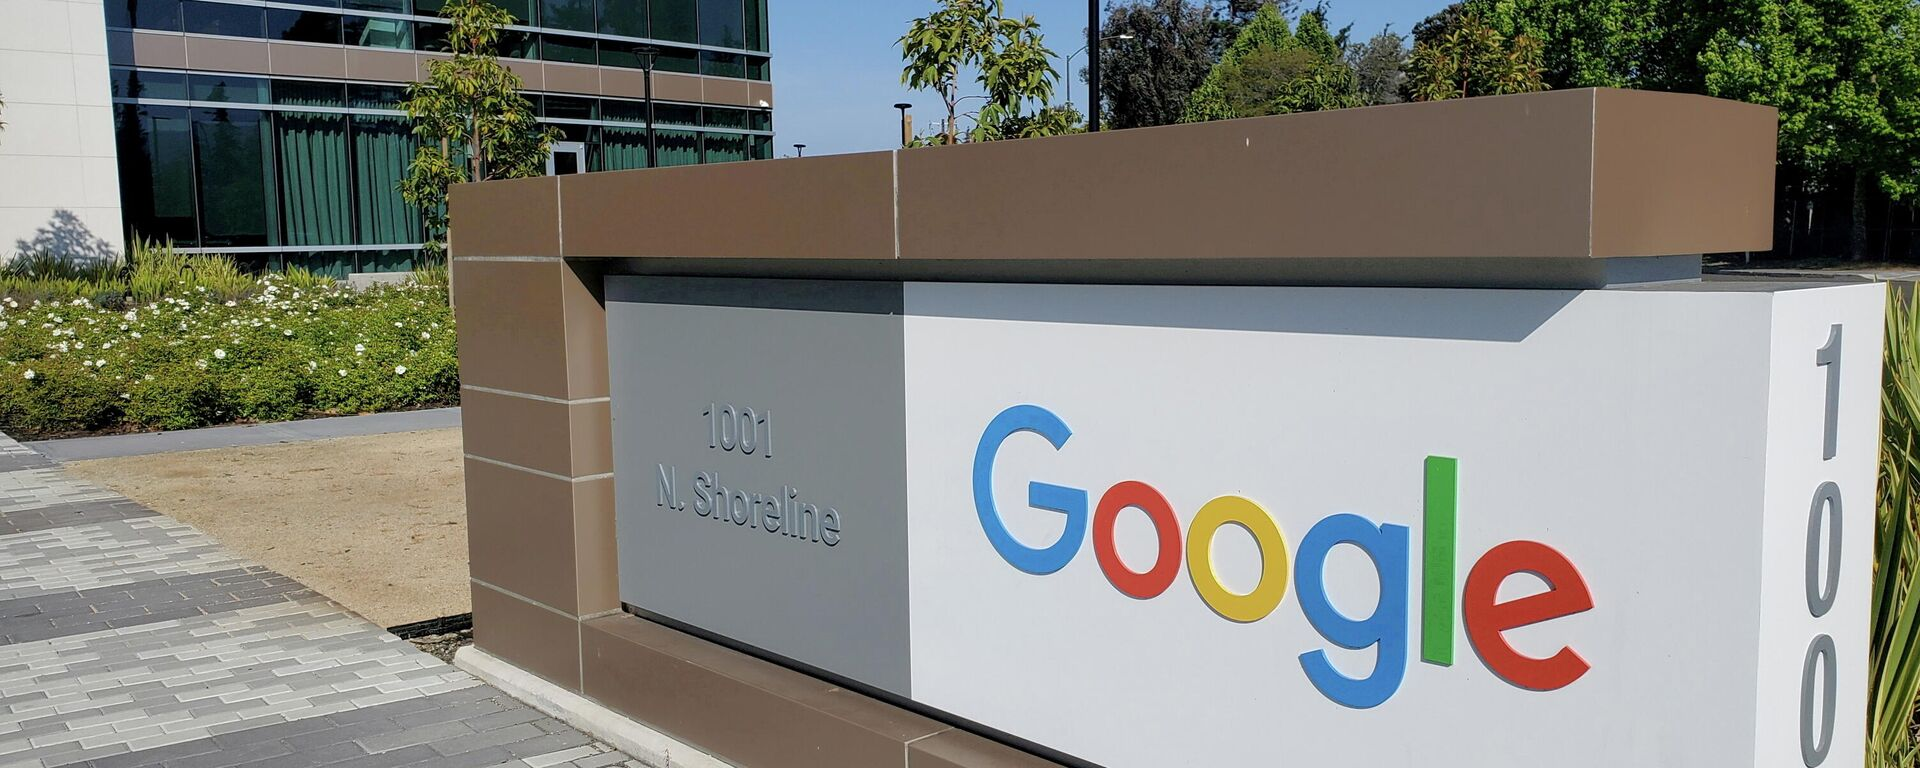 Google-Hauptsitz in Mountain View, US-Bundesstaat Kalifornien (Archiv) - SNA, 1920, 29.09.2021